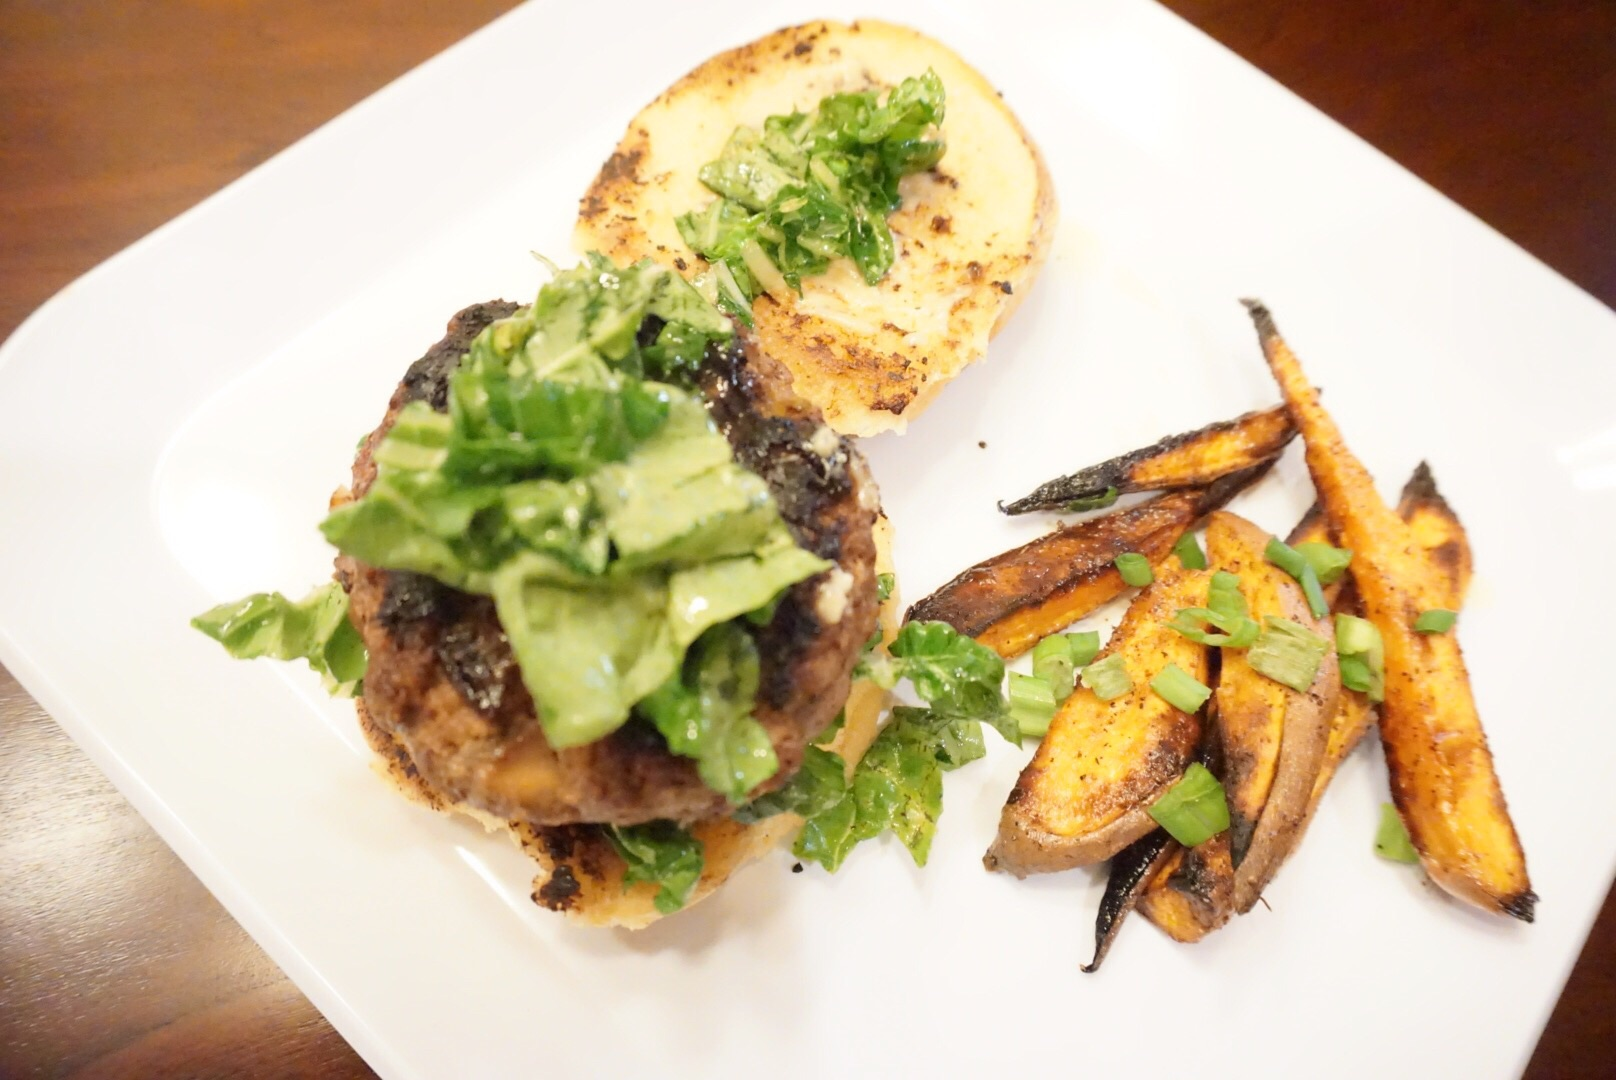 Shiitake & hoisin burger with sweet potato wedges.